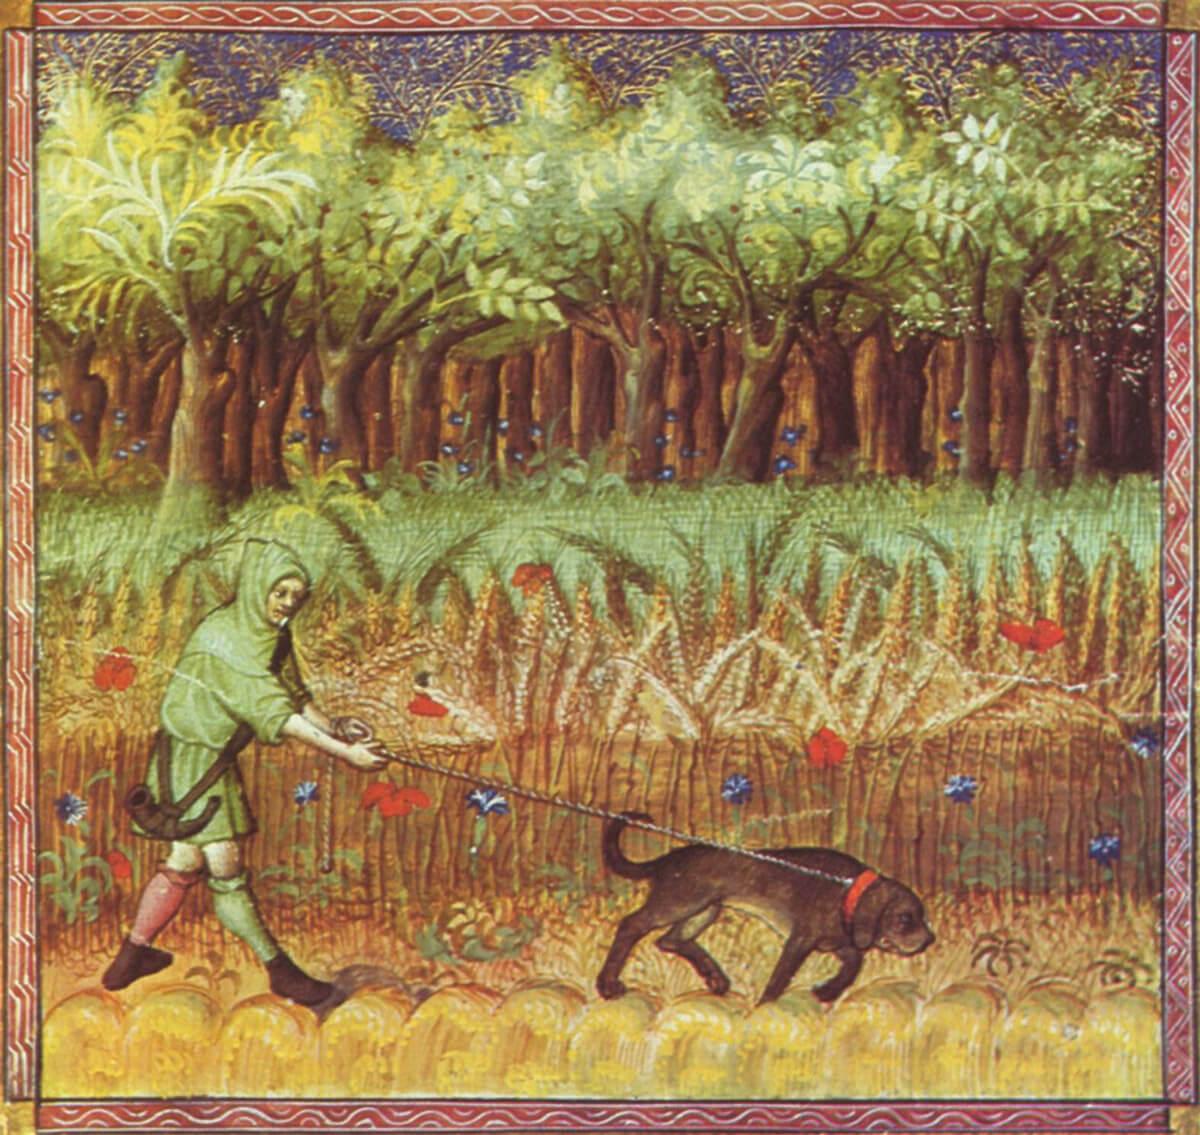 Canis lipus familiaris, libro de la caza